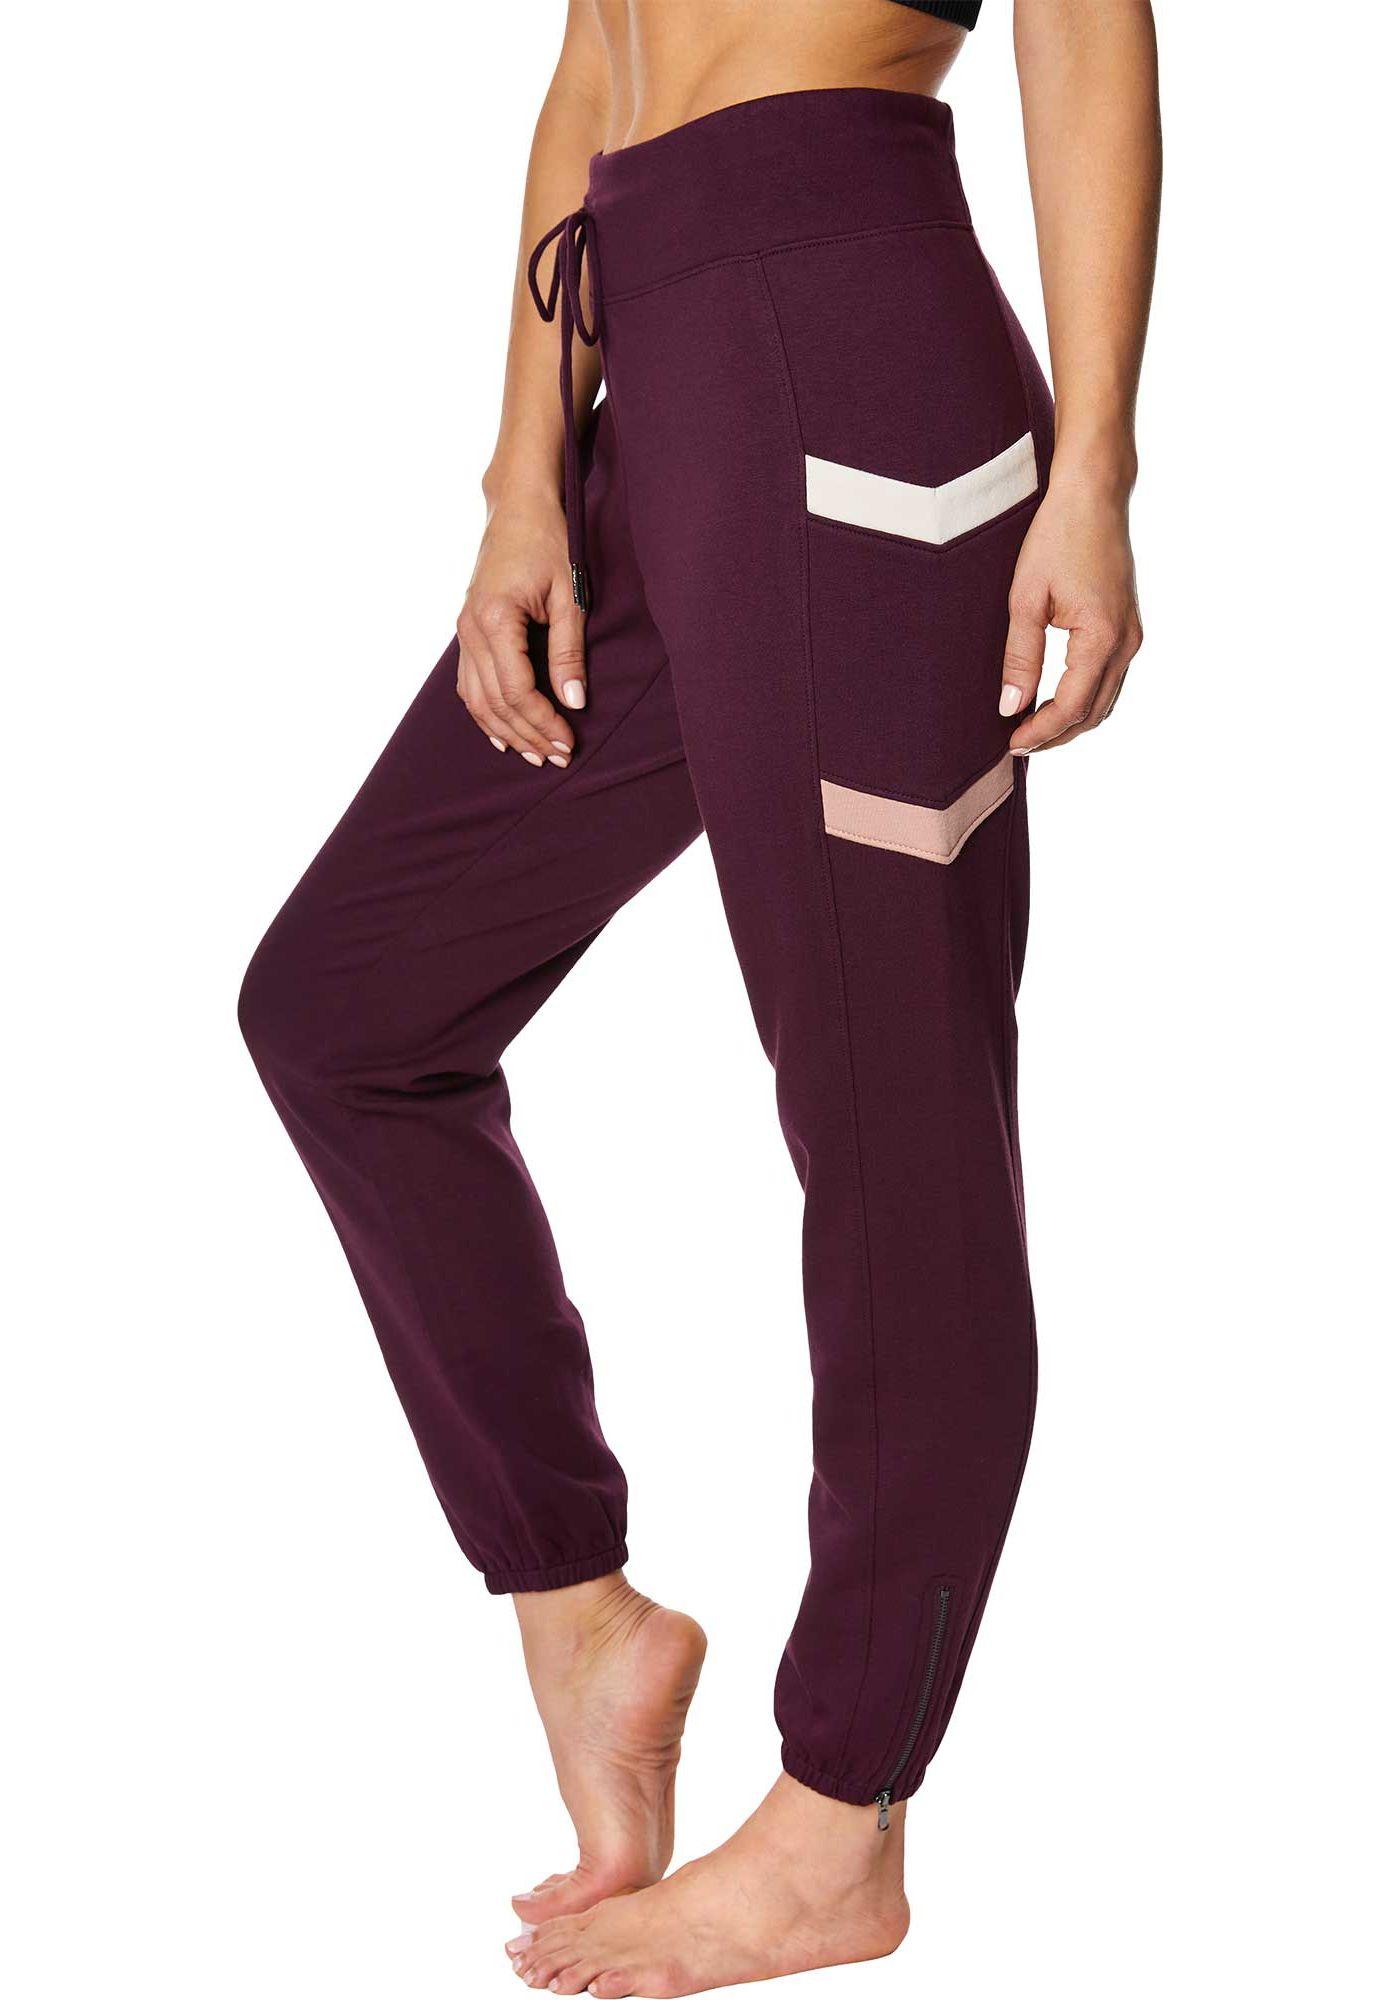 Betsey Johnson Women's Chevron Colorblock Sweatpants